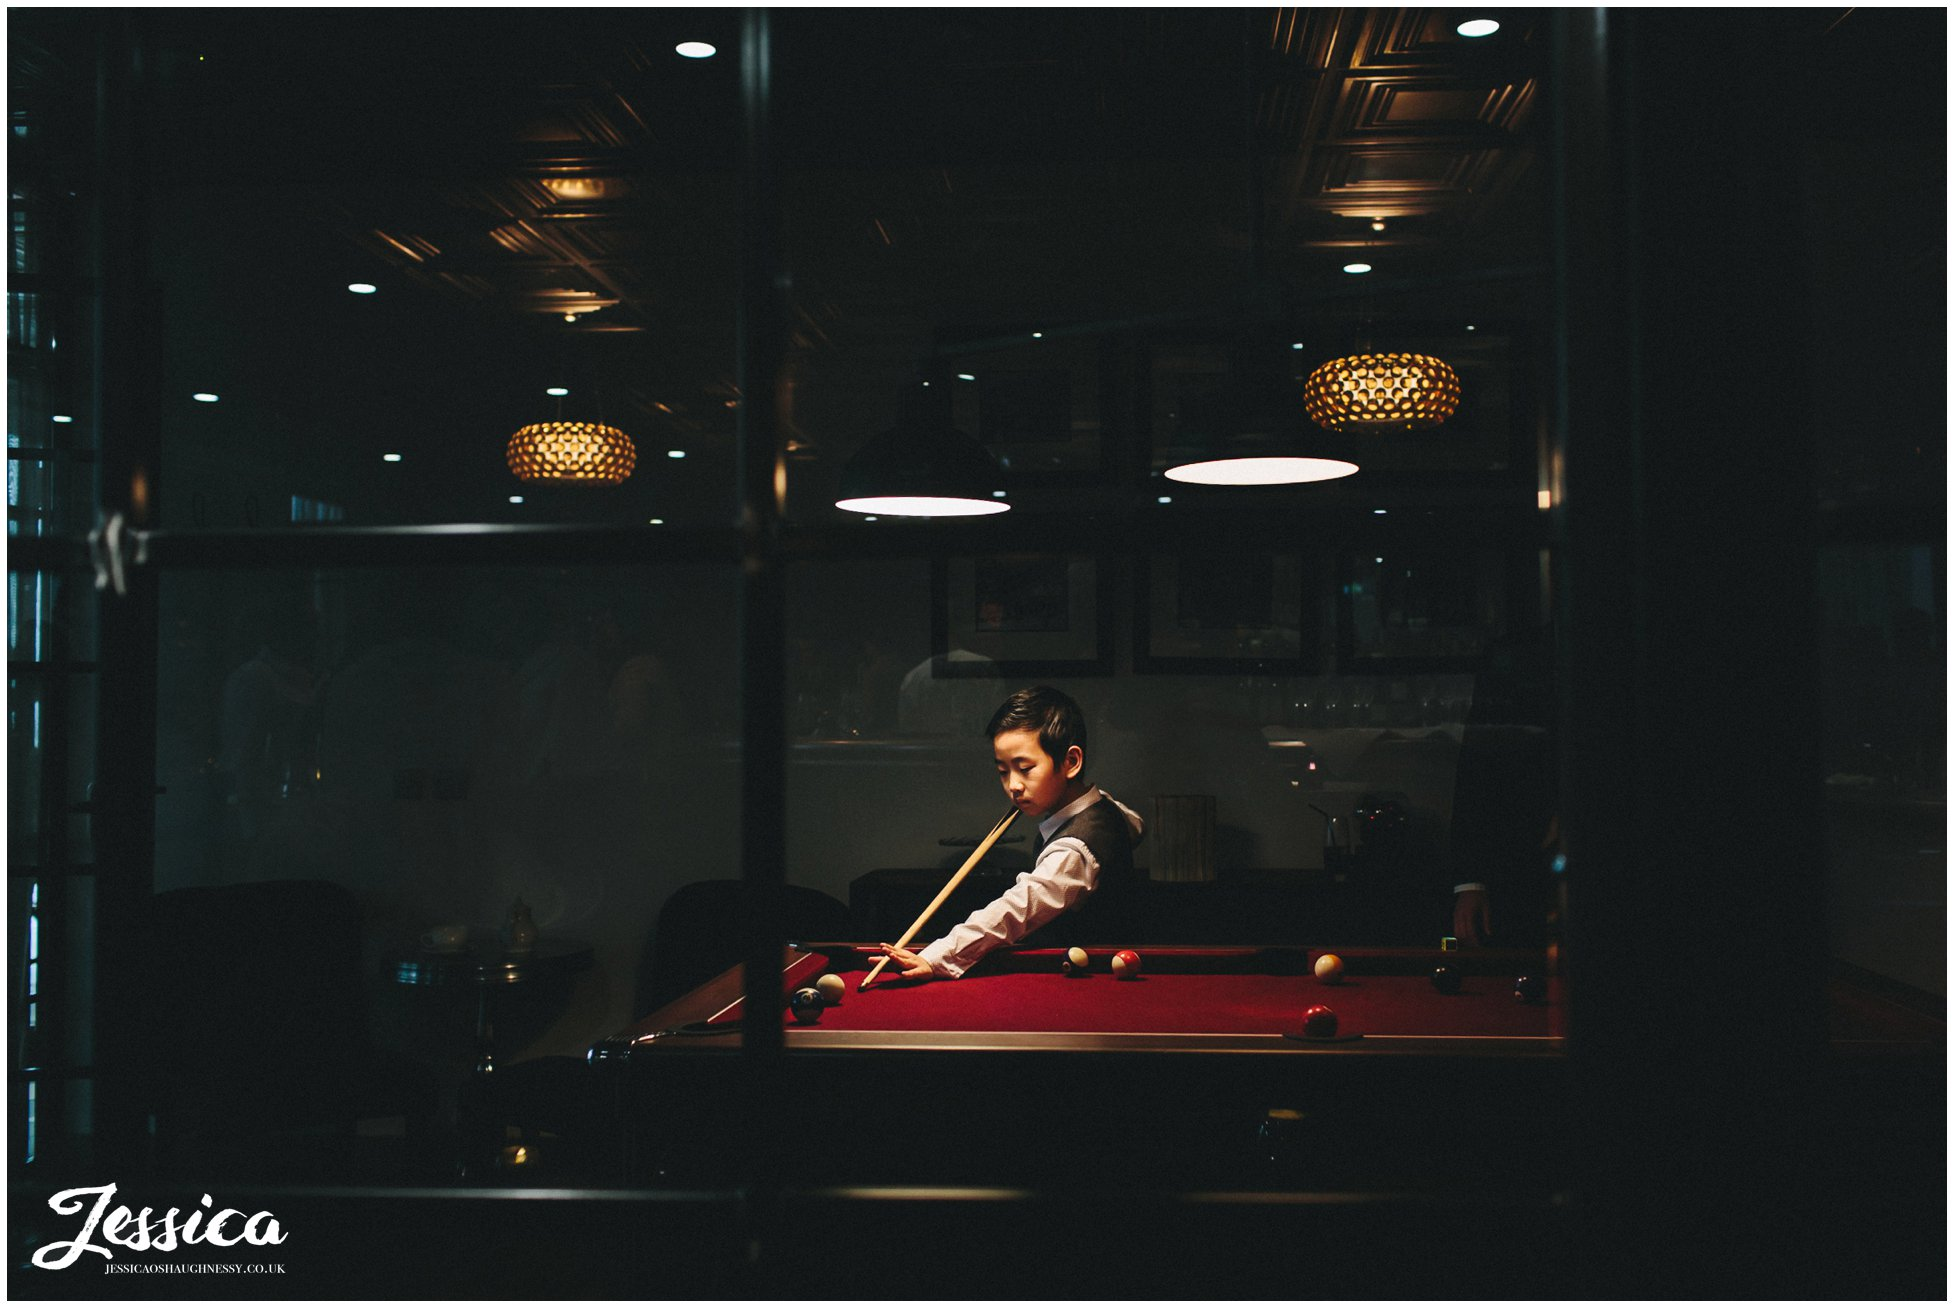 manchester wedding - child plays snooker